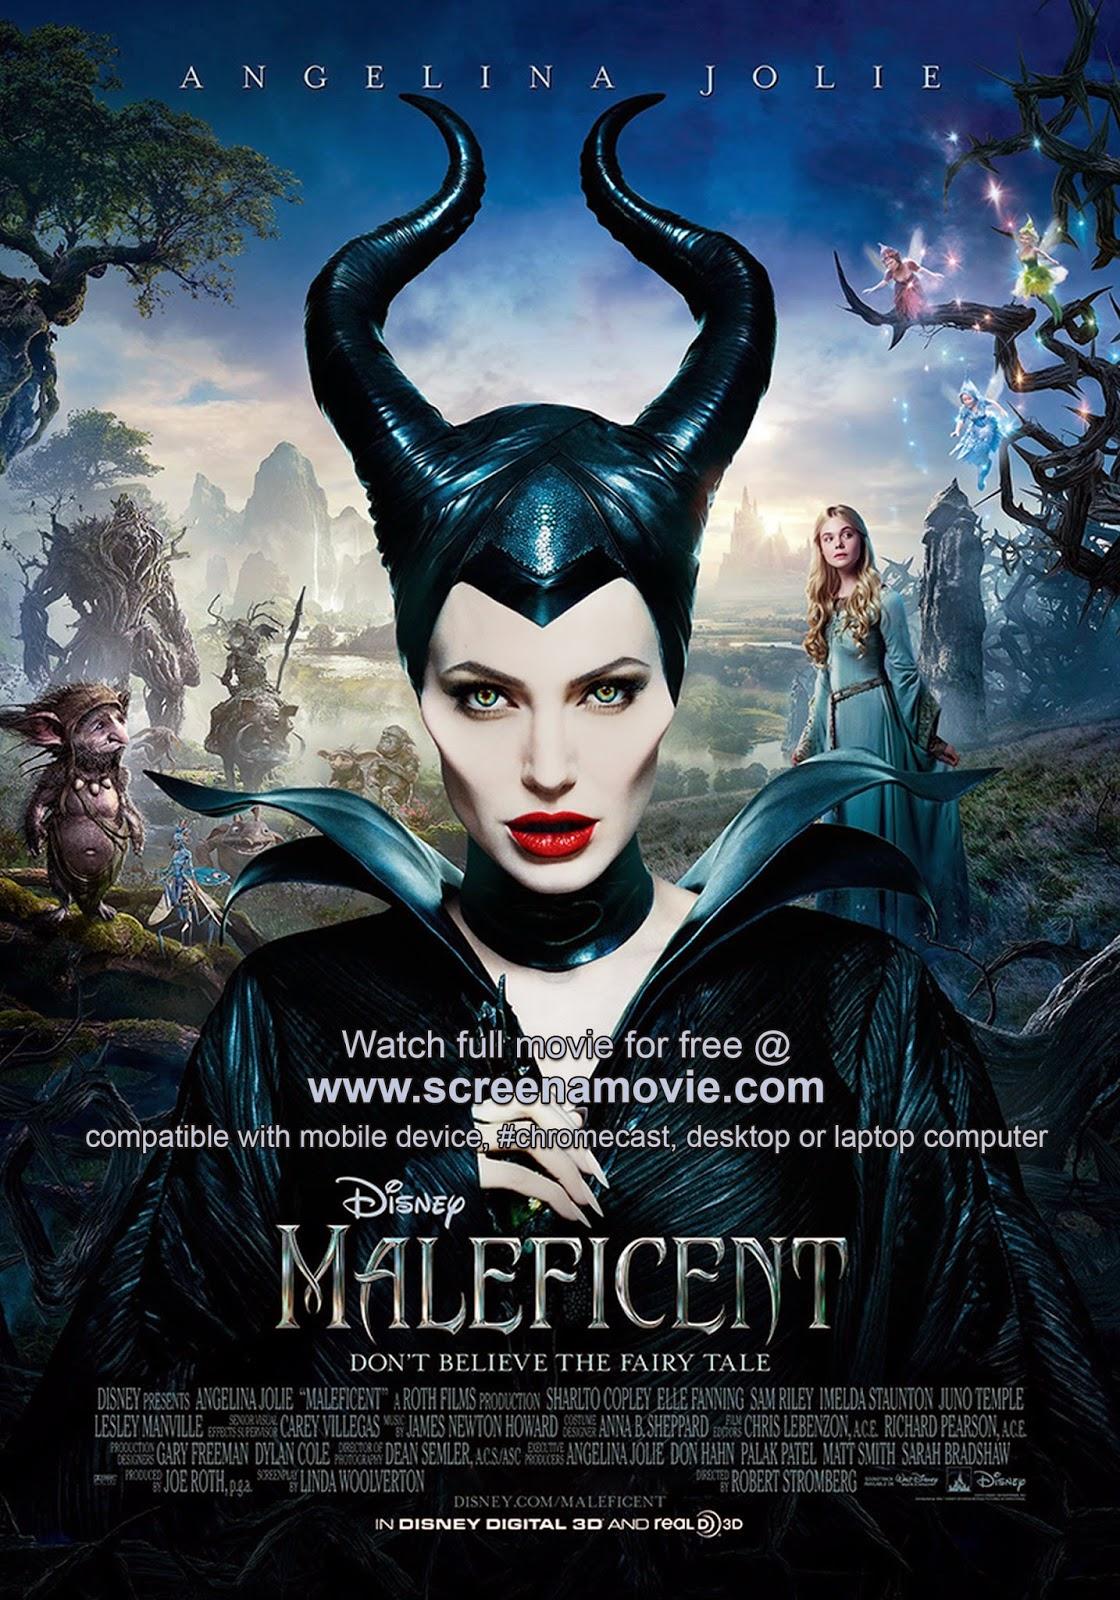 Maleficent_@screenamovie